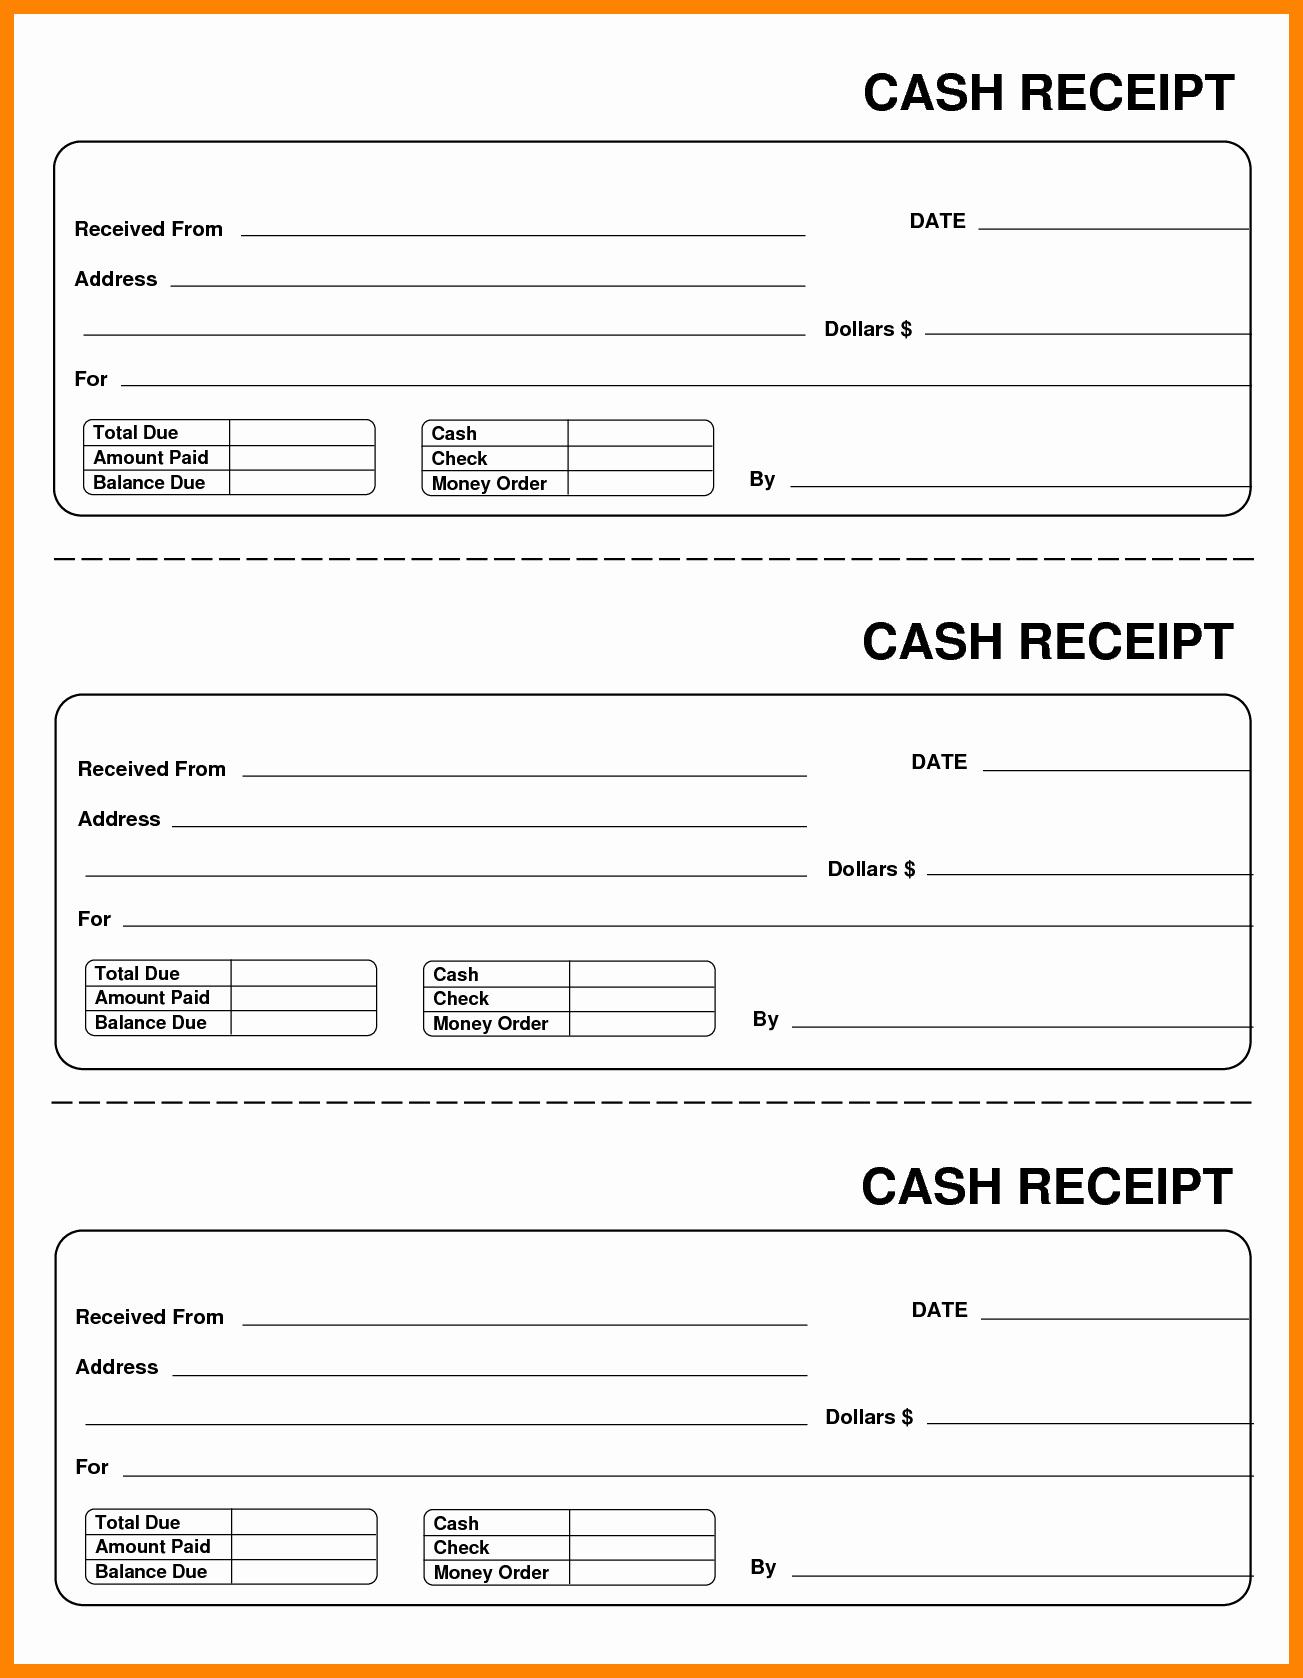 Cash Receipt Template Pdf New Cash Receipt Template Word Doc